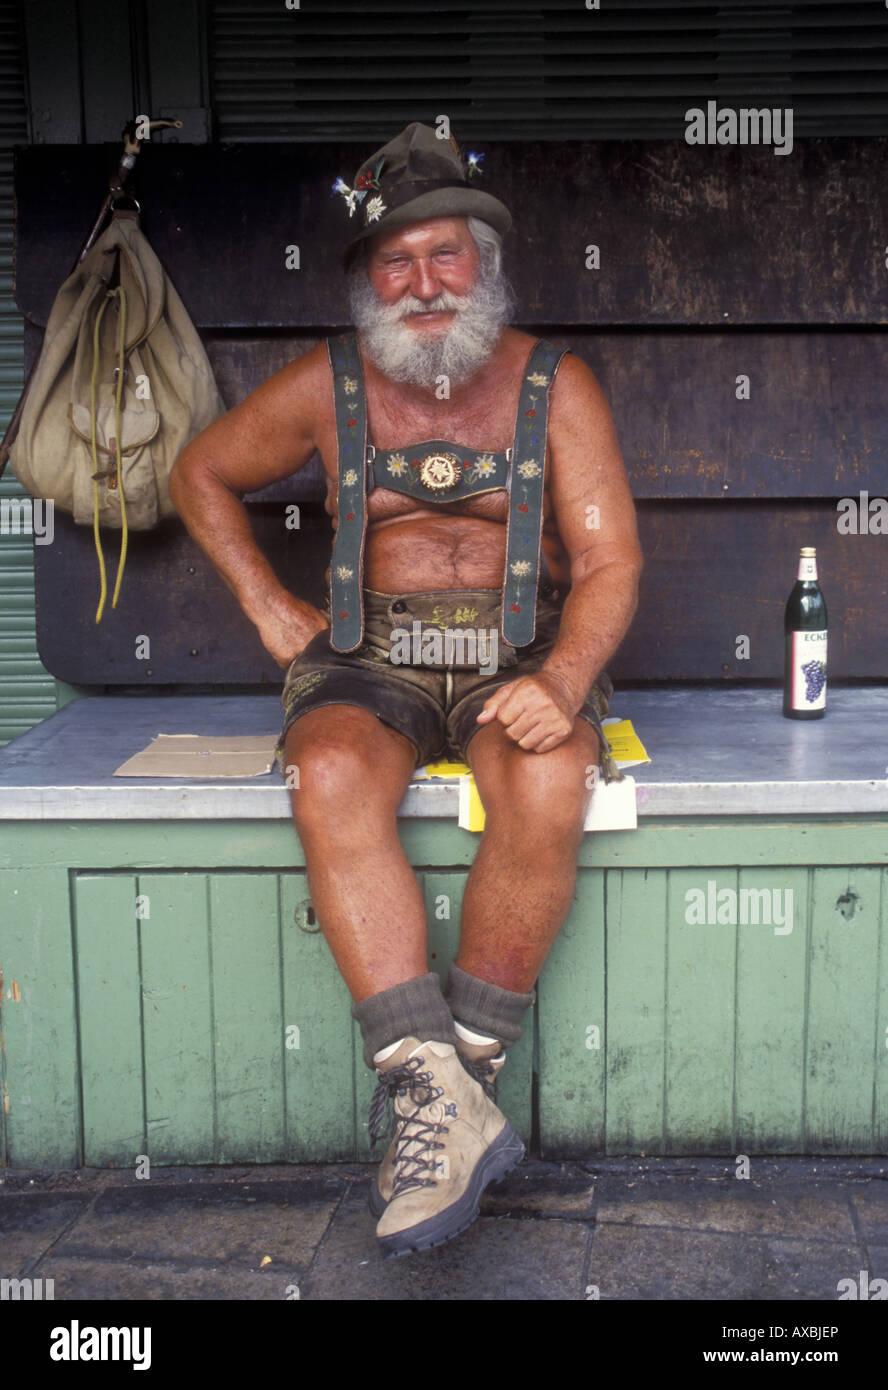 Man dressed in Lederhosen, market, Munich, Bavaria, Germany - Stock Image